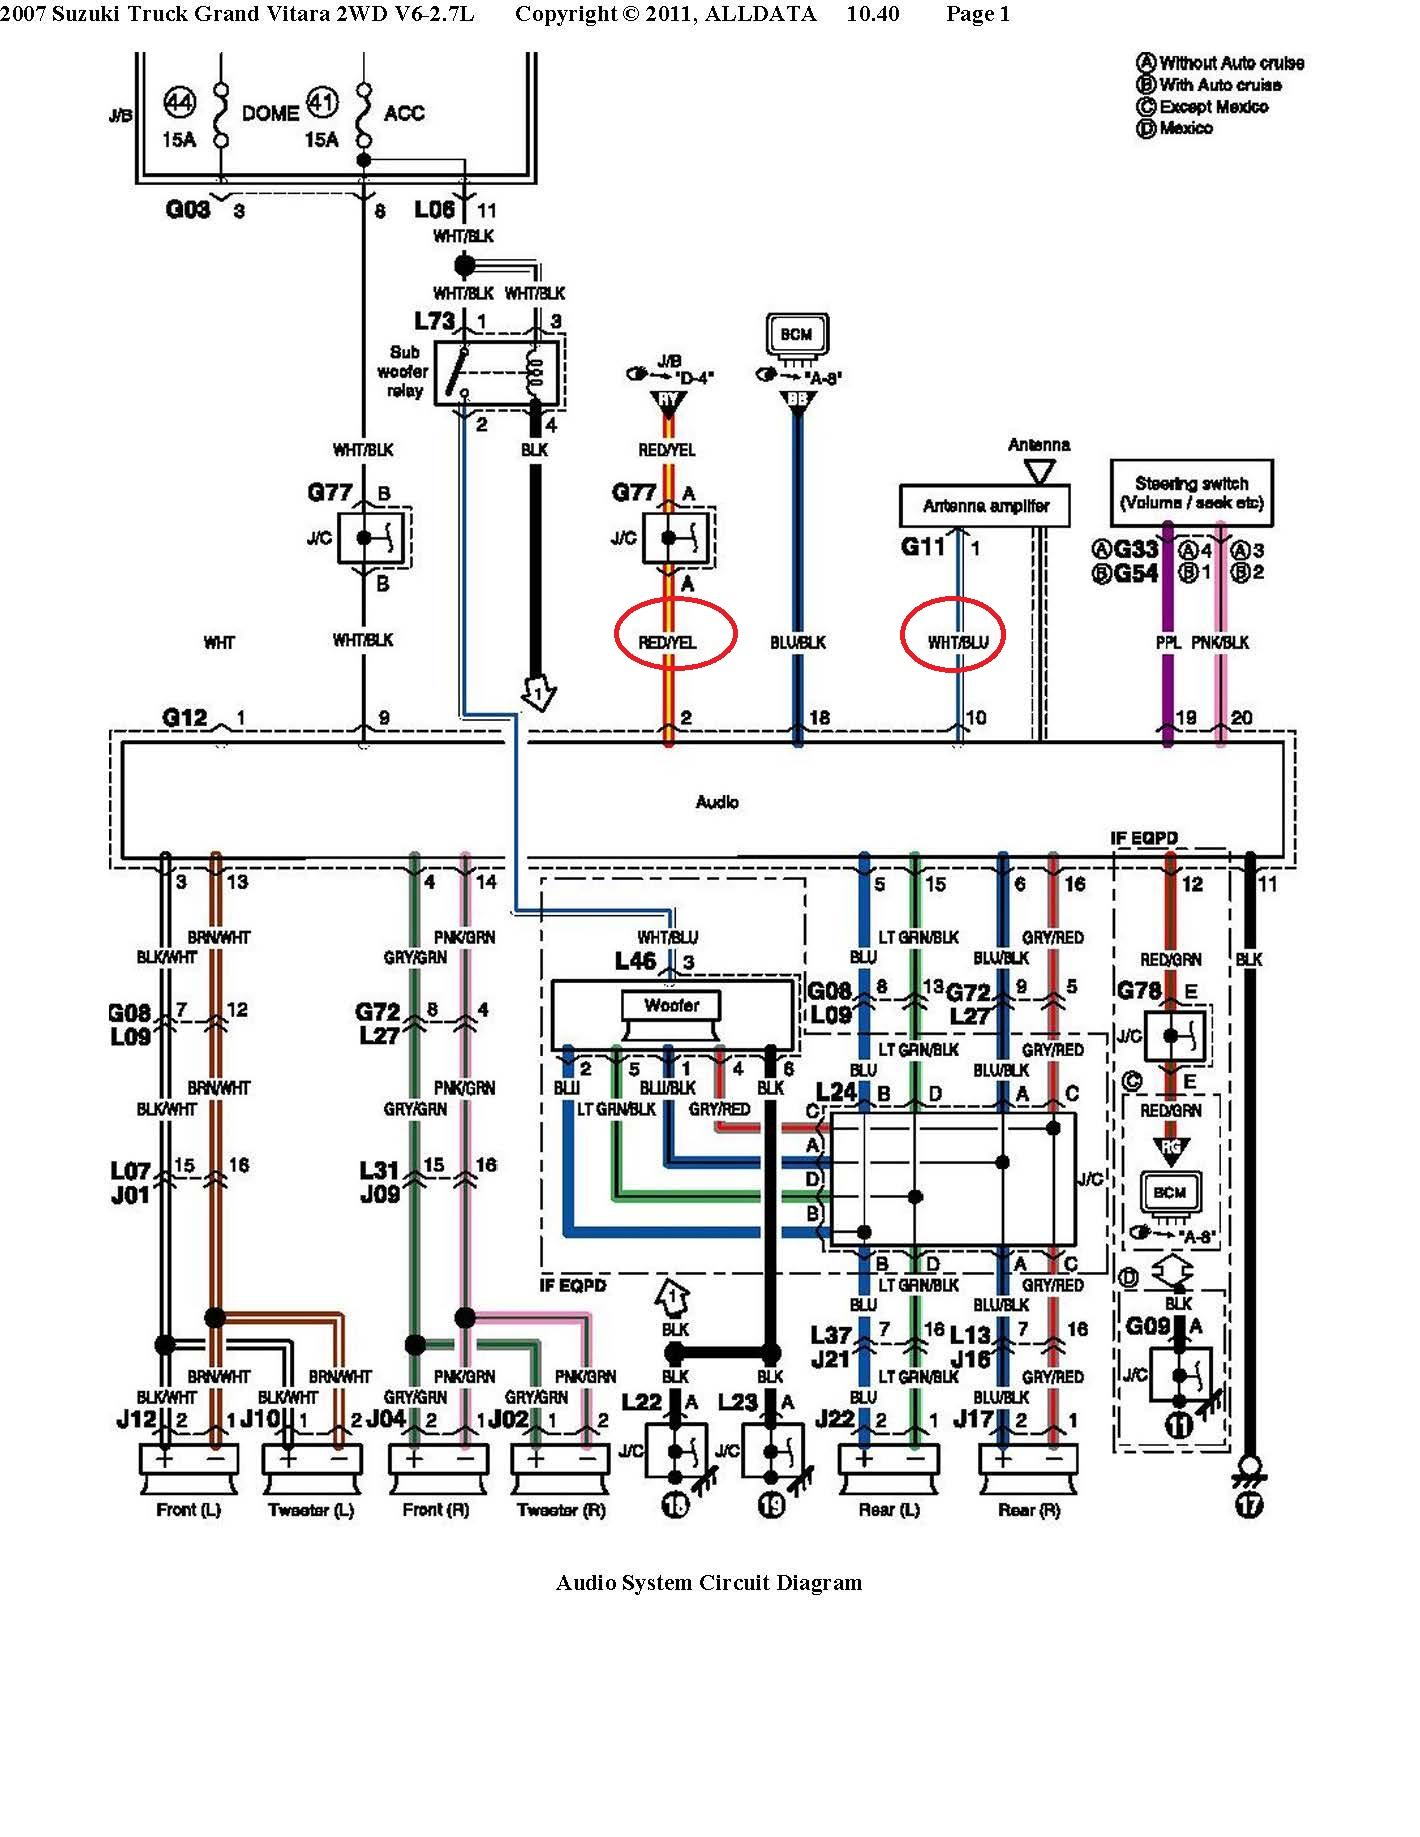 Veracruz Stereo Wiring Harness Diagram 1977 Chevelle Air Conditioning Wiring Diagram Bege Wiring Diagram